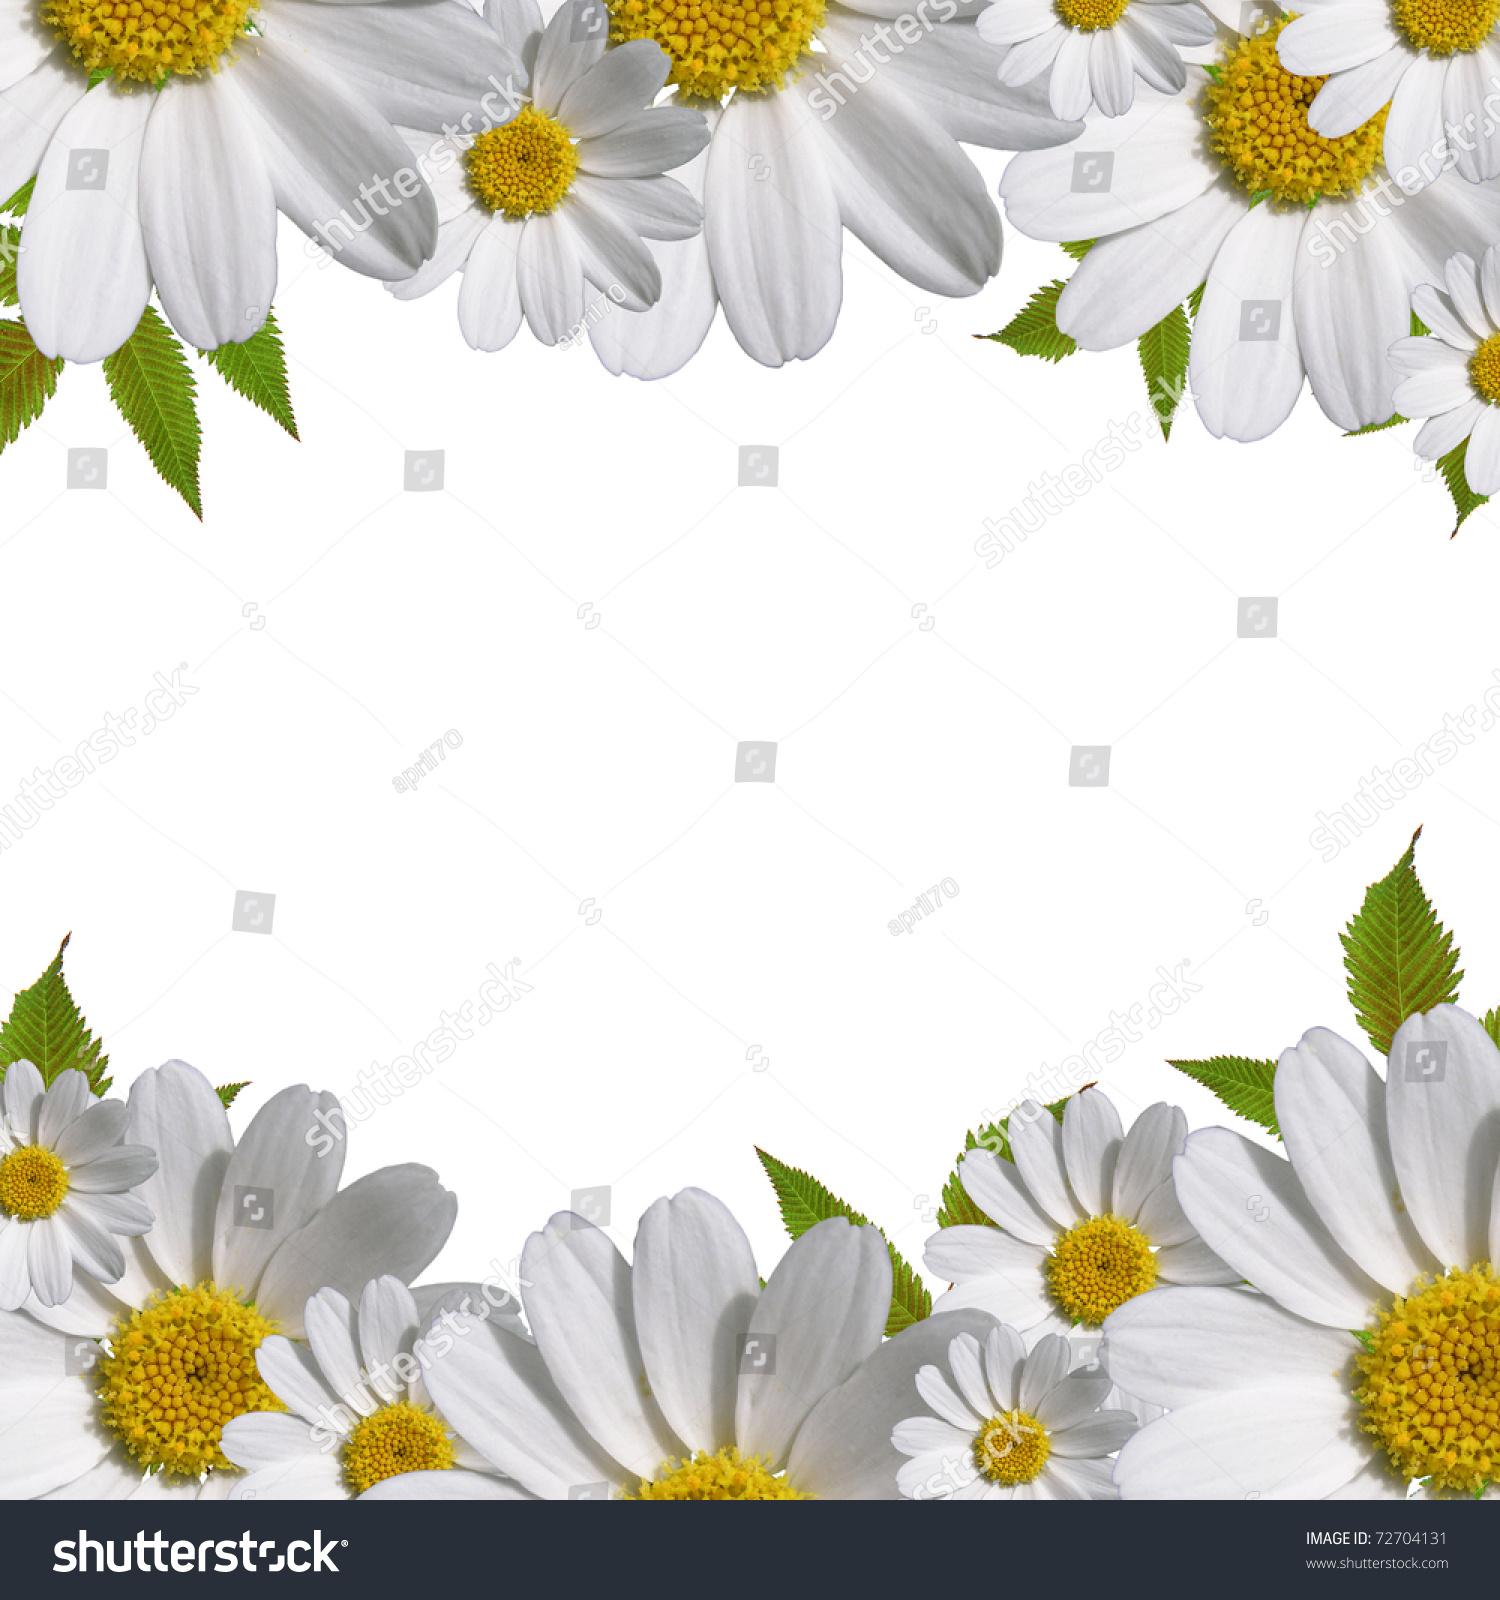 Daisy flowers border copy space stock illustration 72704131 daisy flowers border with copy space izmirmasajfo